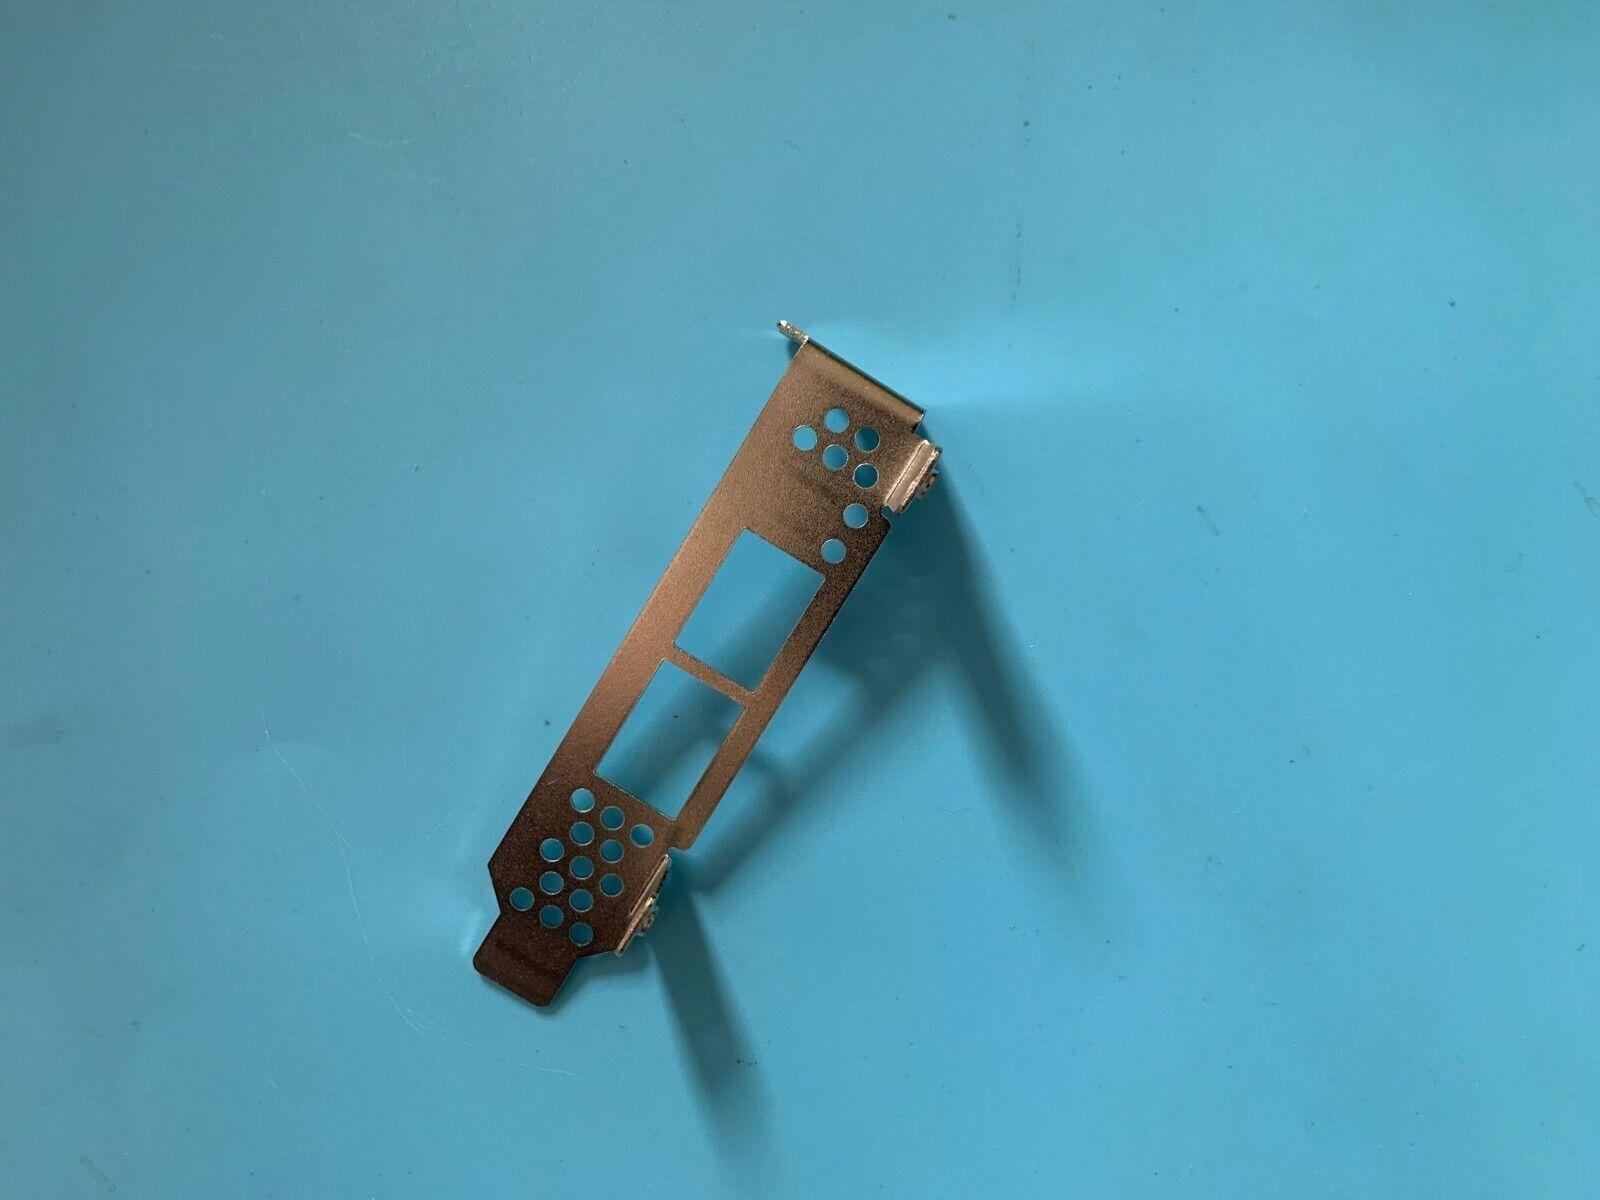 50PCS Low Profile bracket for Chelsio T520-CR T420-CR T520-LL-CR T520-SO-CR